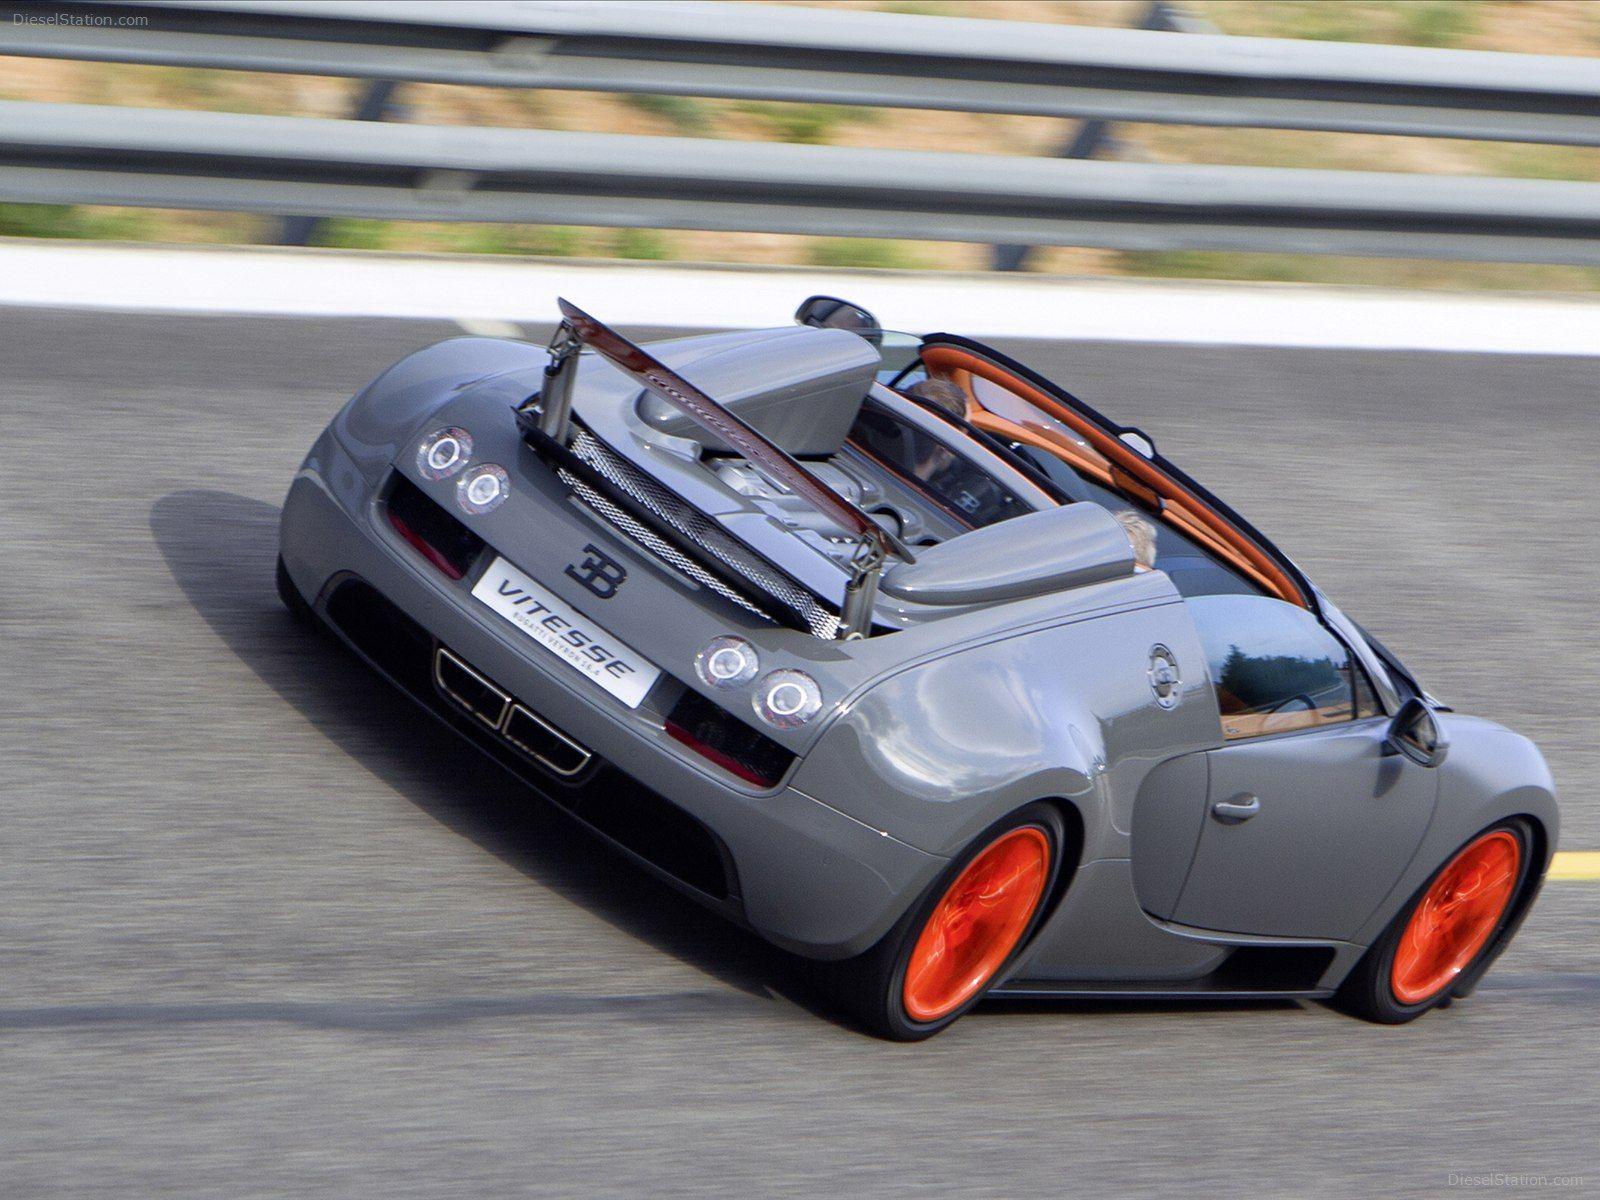 c0f38b646bdec15c6a3a31de792b8b39 Astounding Xe Bugatti Veyron Grand Sport Vitesse Cars Trend